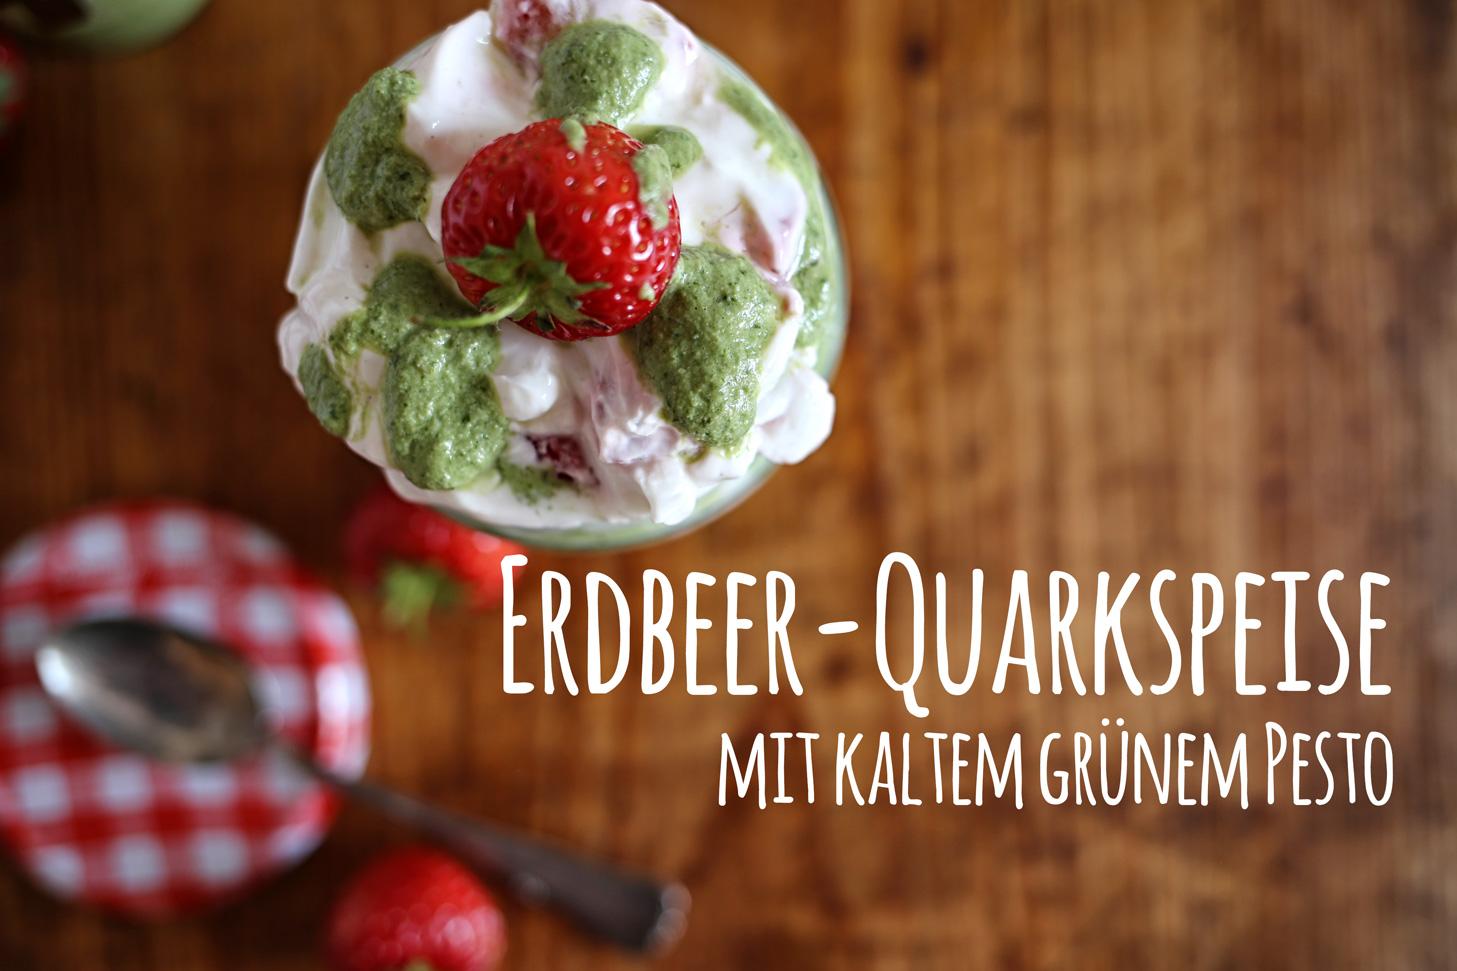 Erdbeer-Quarkspeise